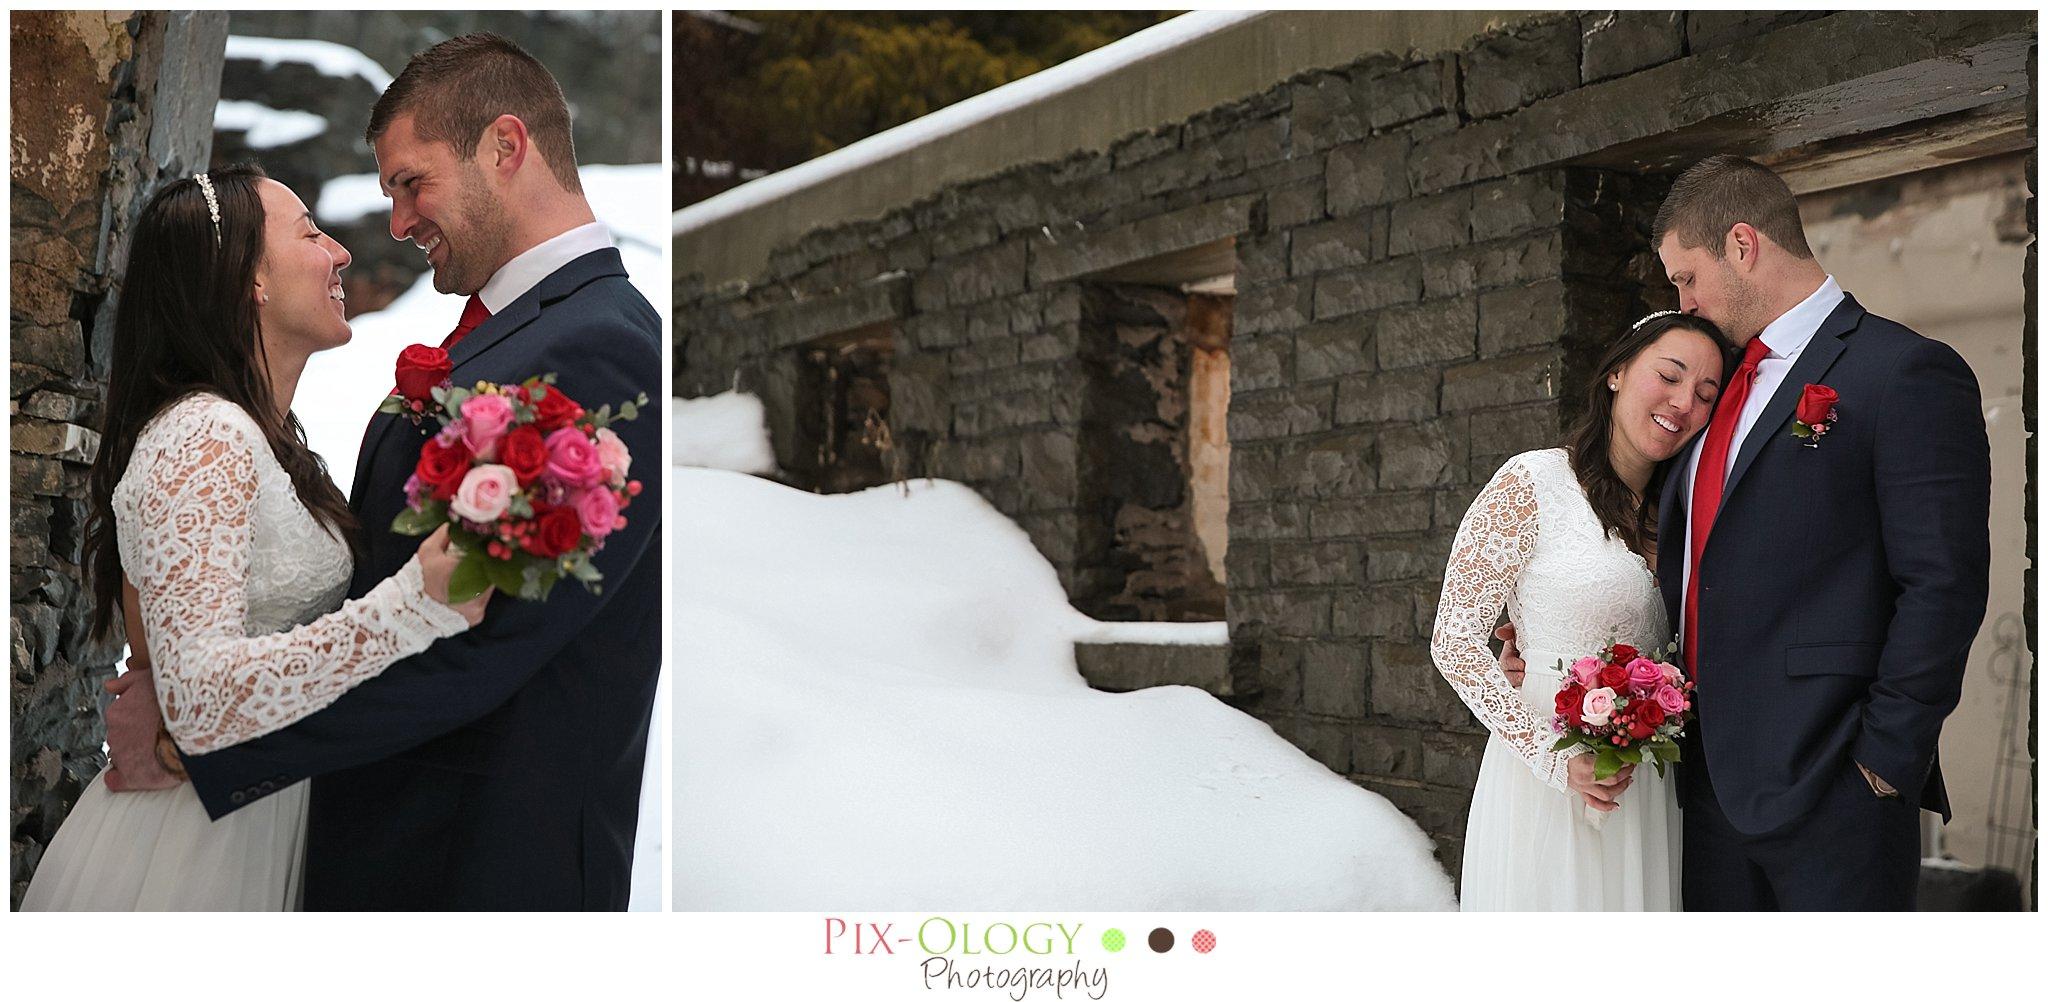 pix-ology-photography-ledges-hotel-wedding-bride-groom